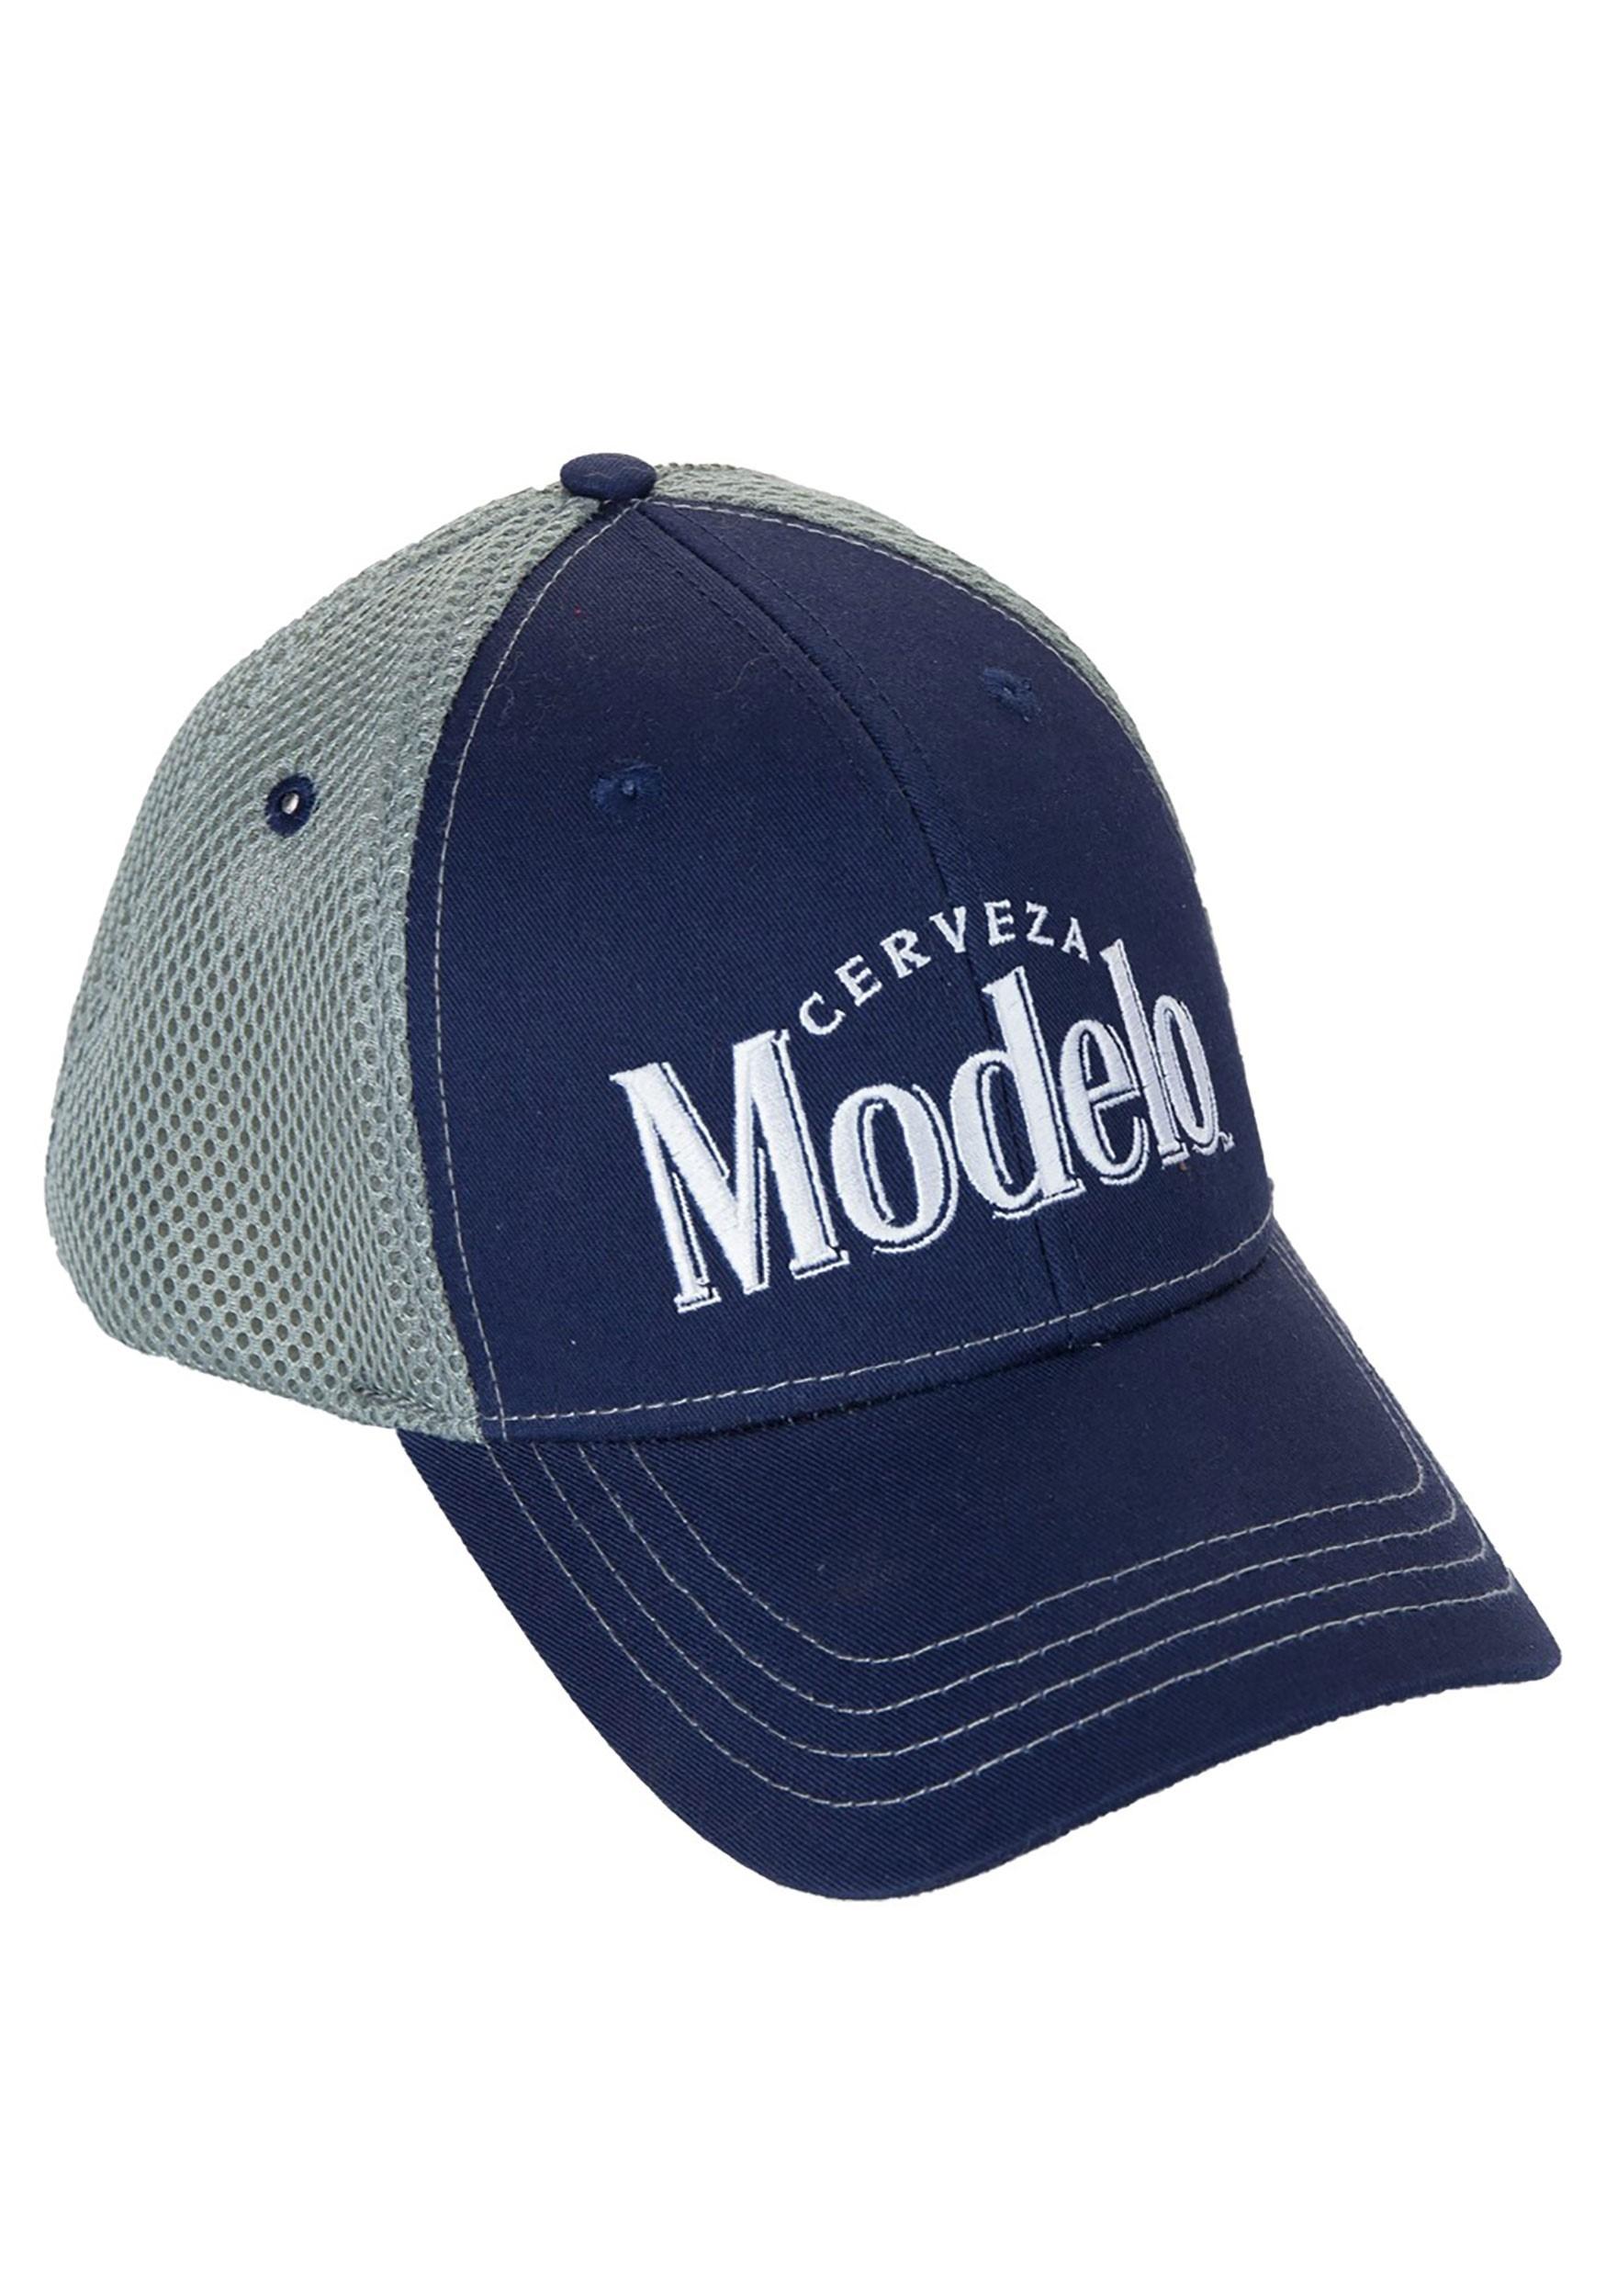 Cerveza Modelo Blue and Gray Baseball Cap